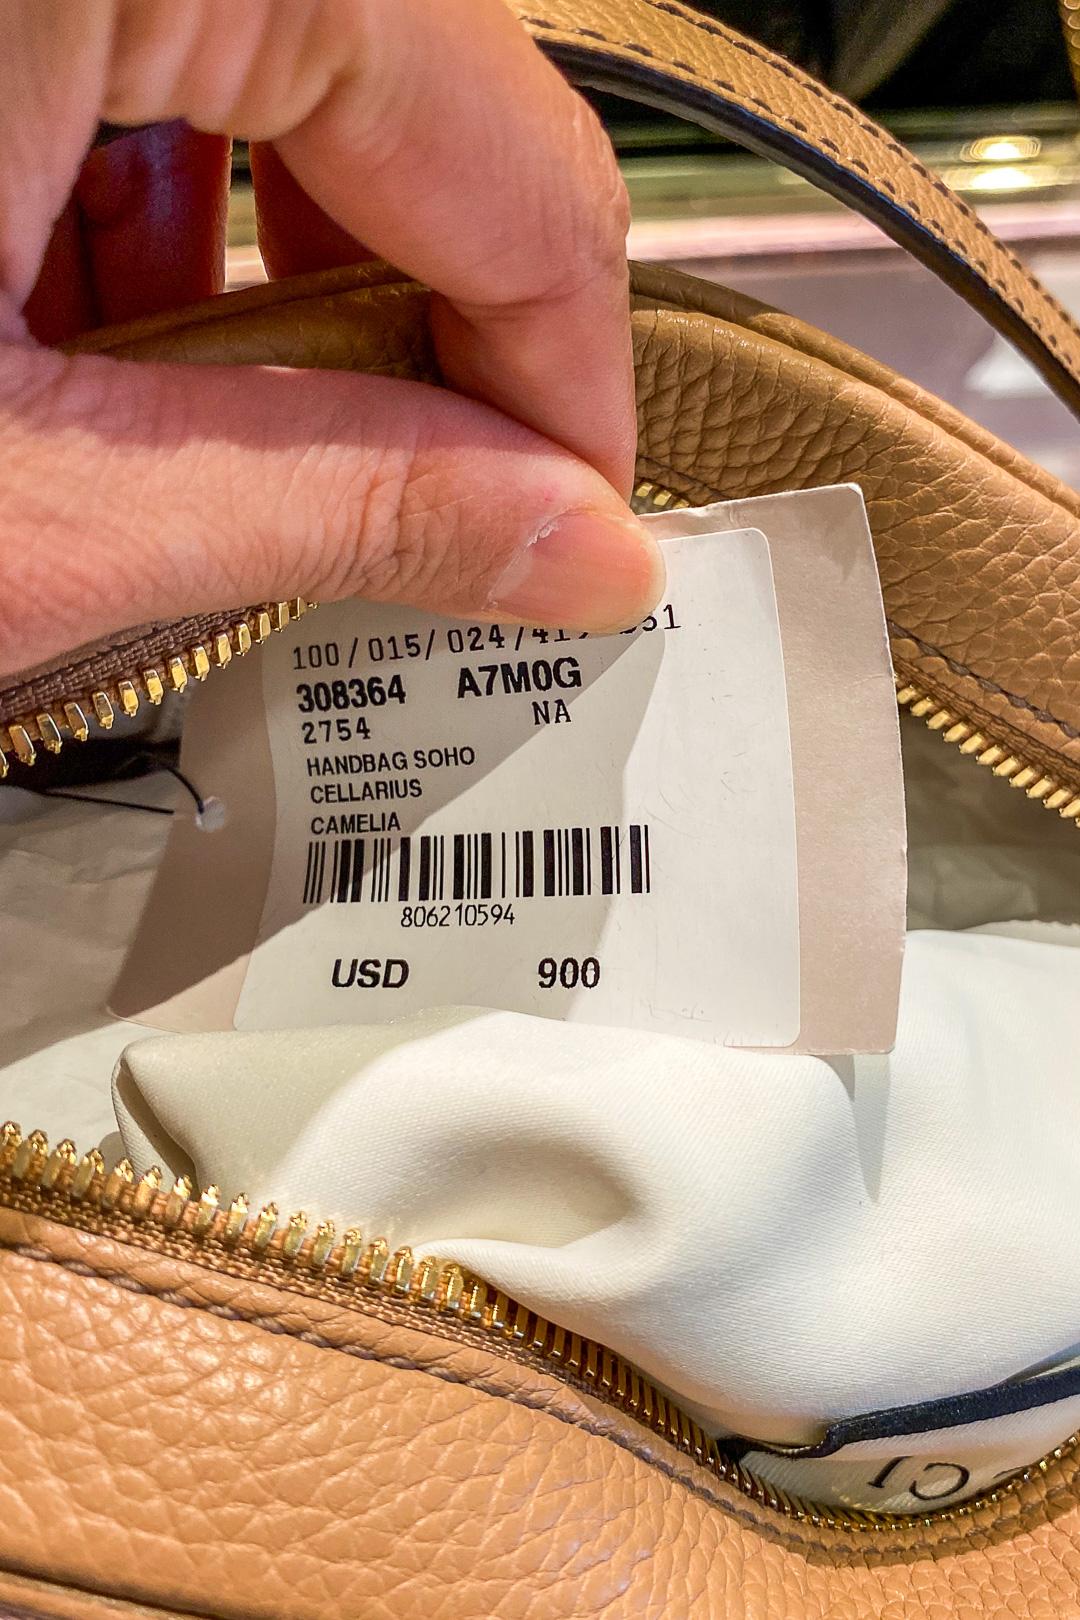 Gucci Hawaii Waikiki Soho Small Leather Disco Bag Price